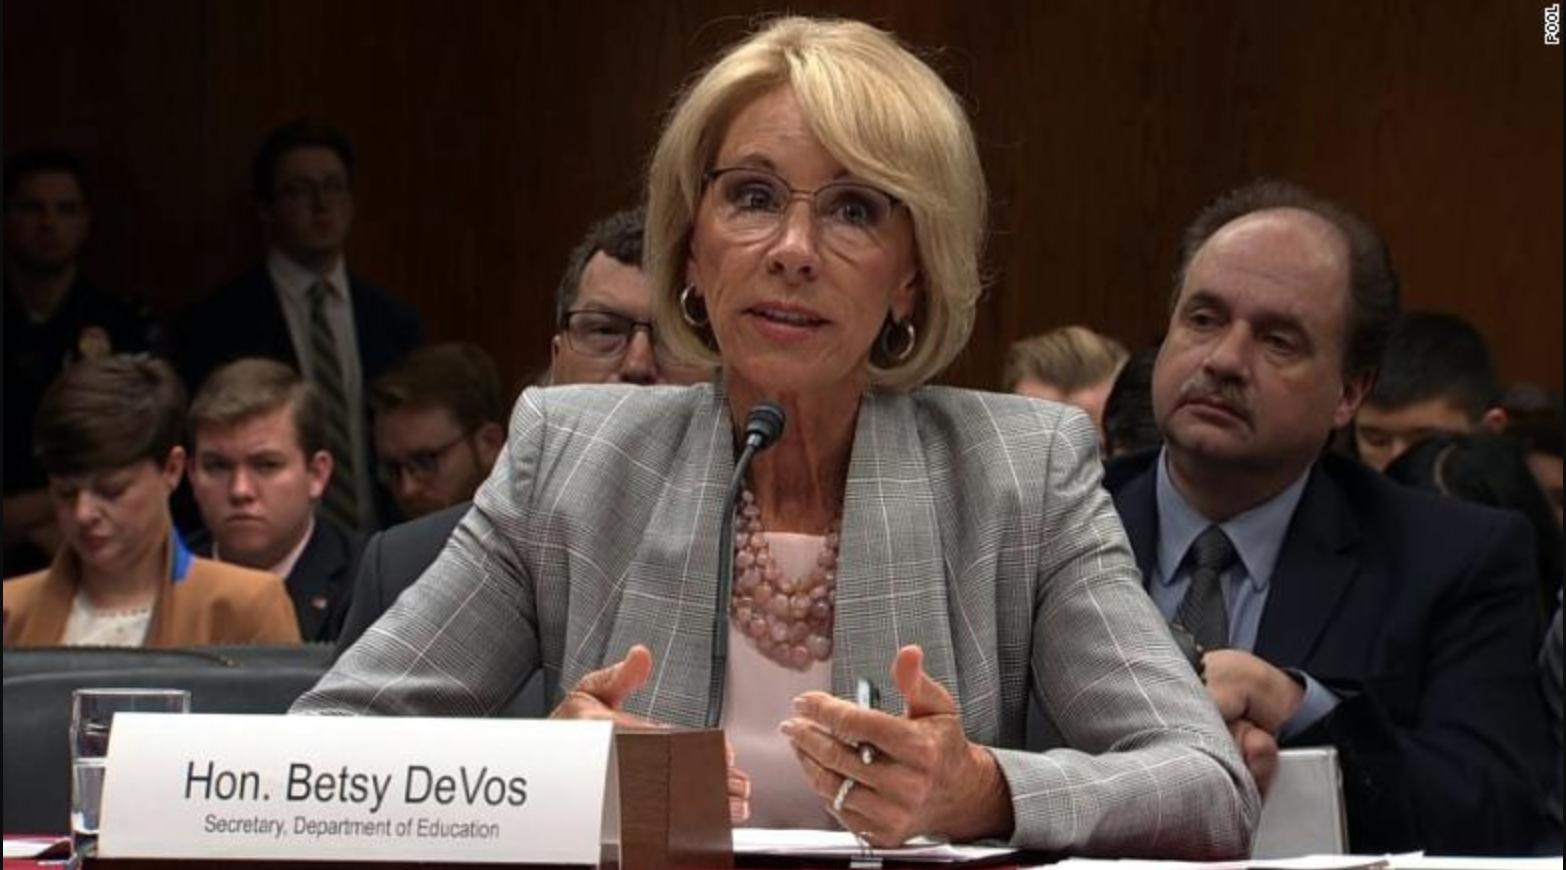 Photo of Secretary of Education Betsy DeVos at a congressional hearing